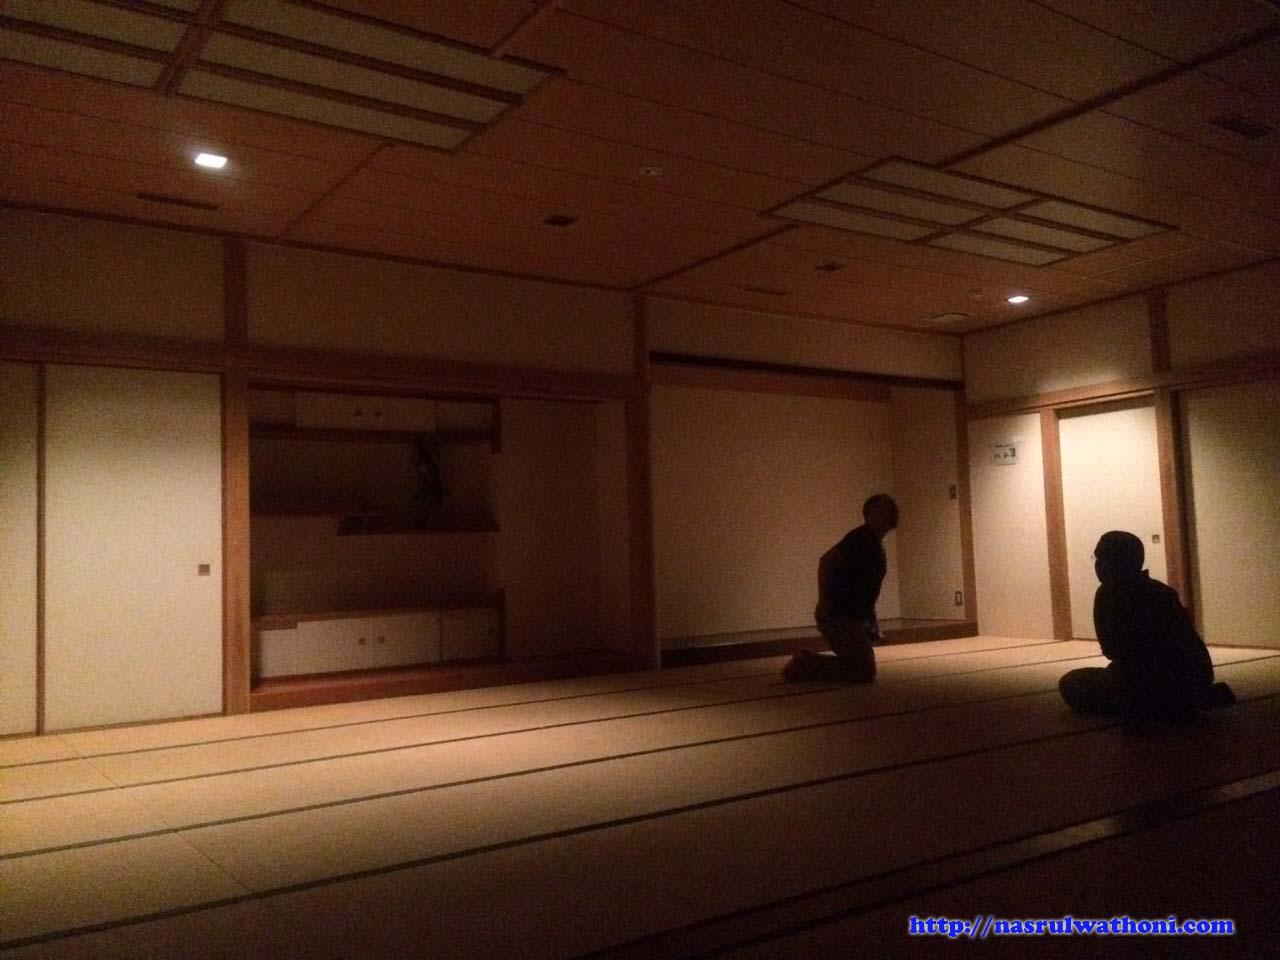 refraction in tatami room